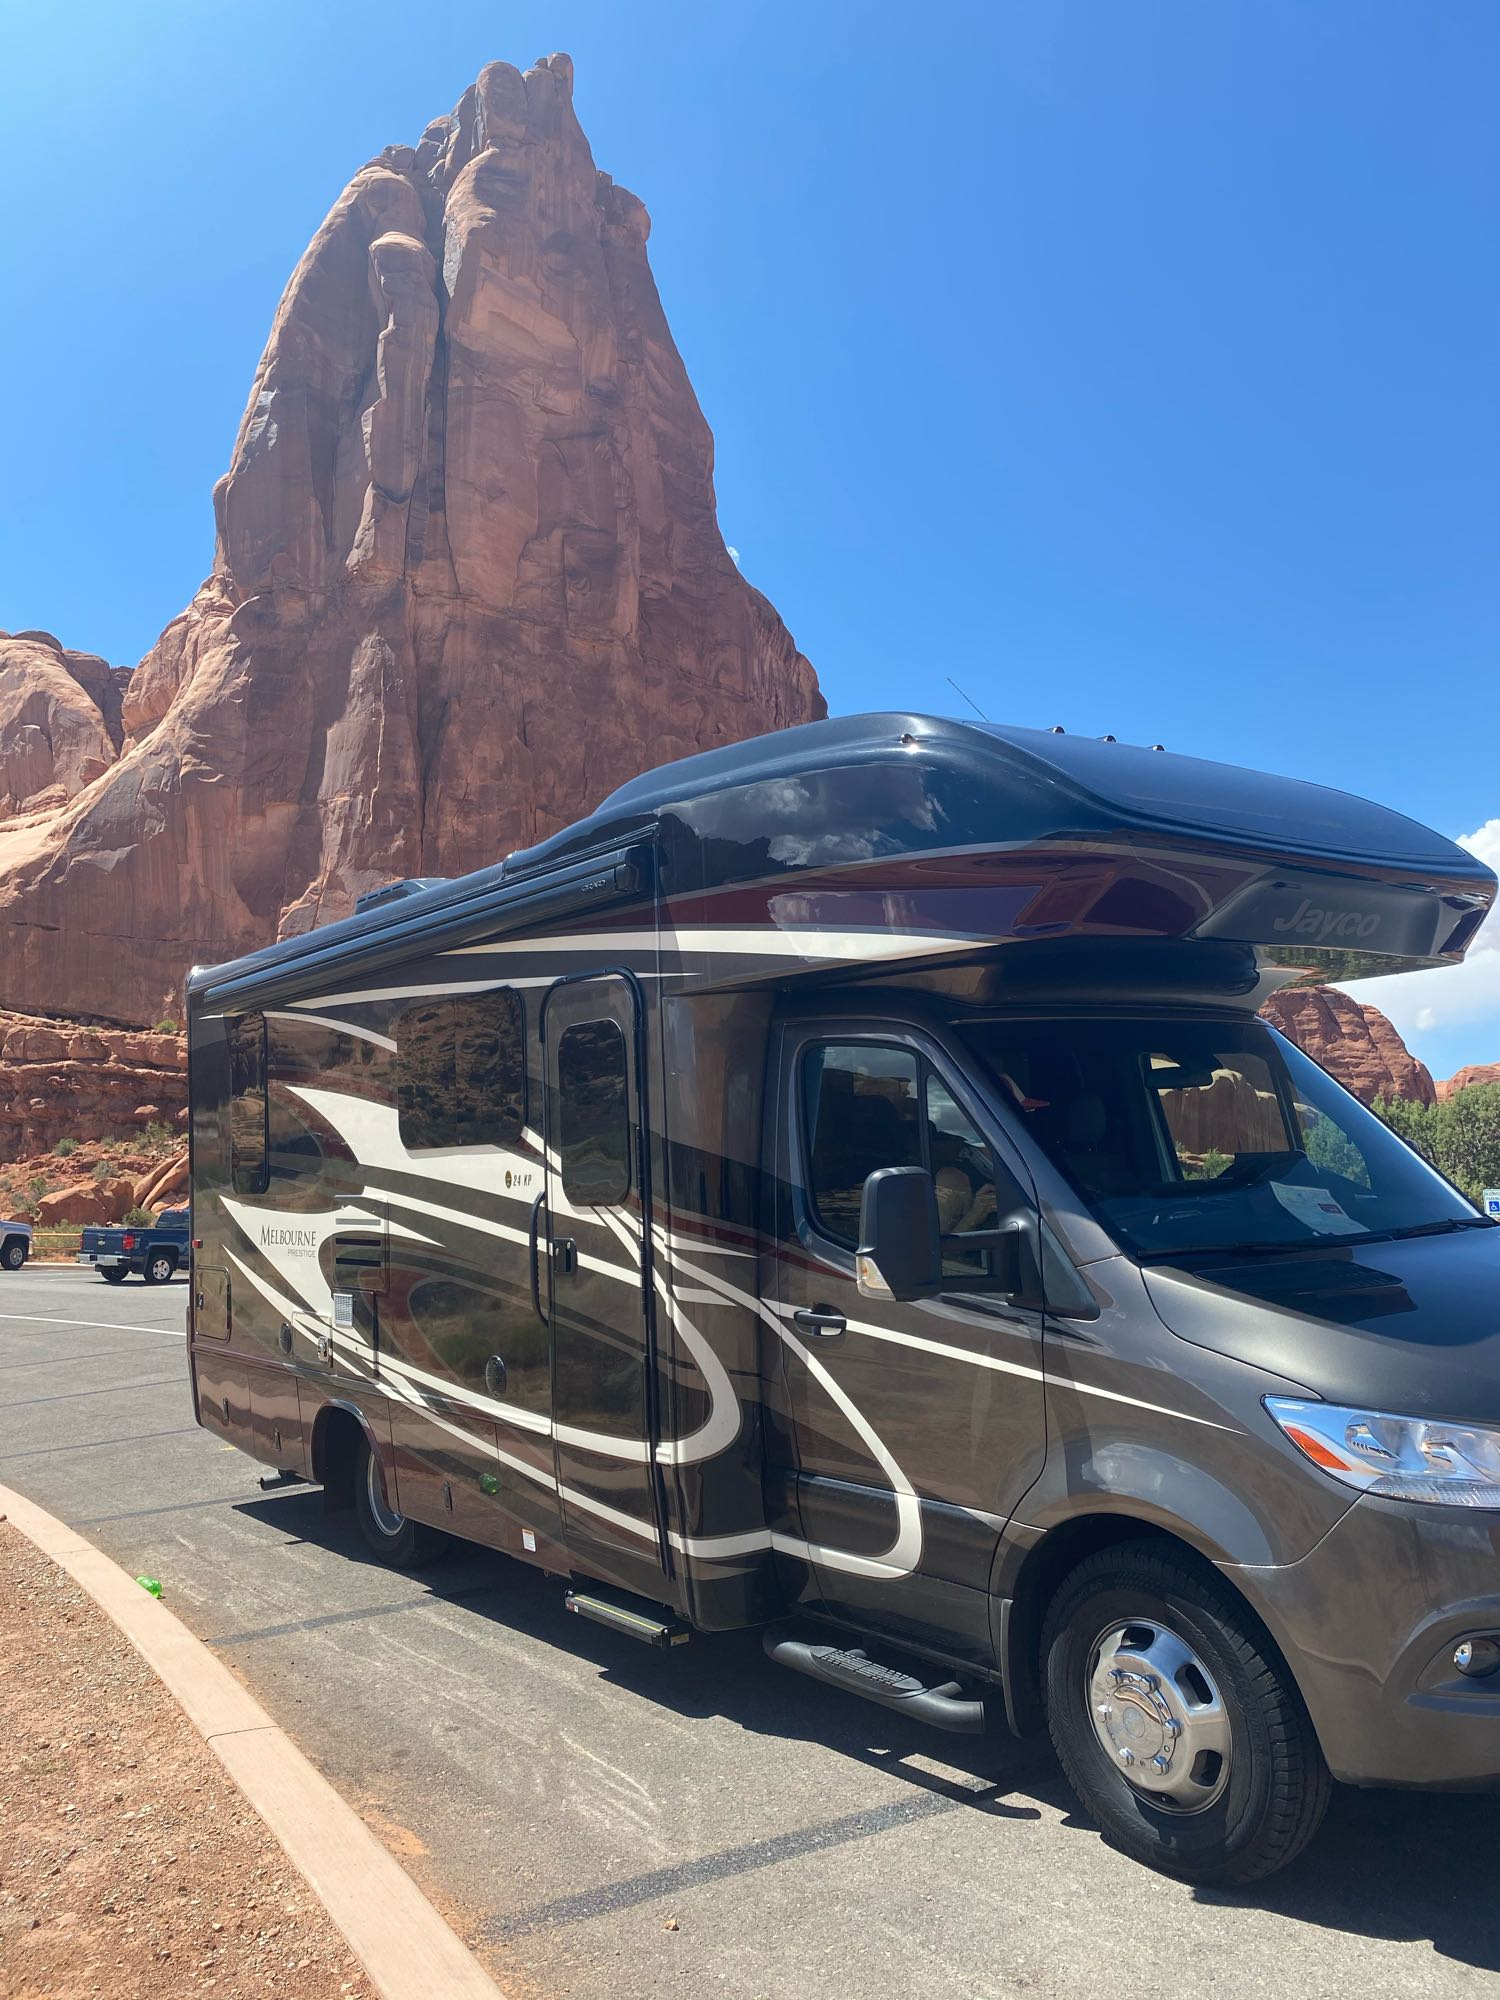 Arches National Park - Moab, UT. Jayco Melbourne Prestige 2020